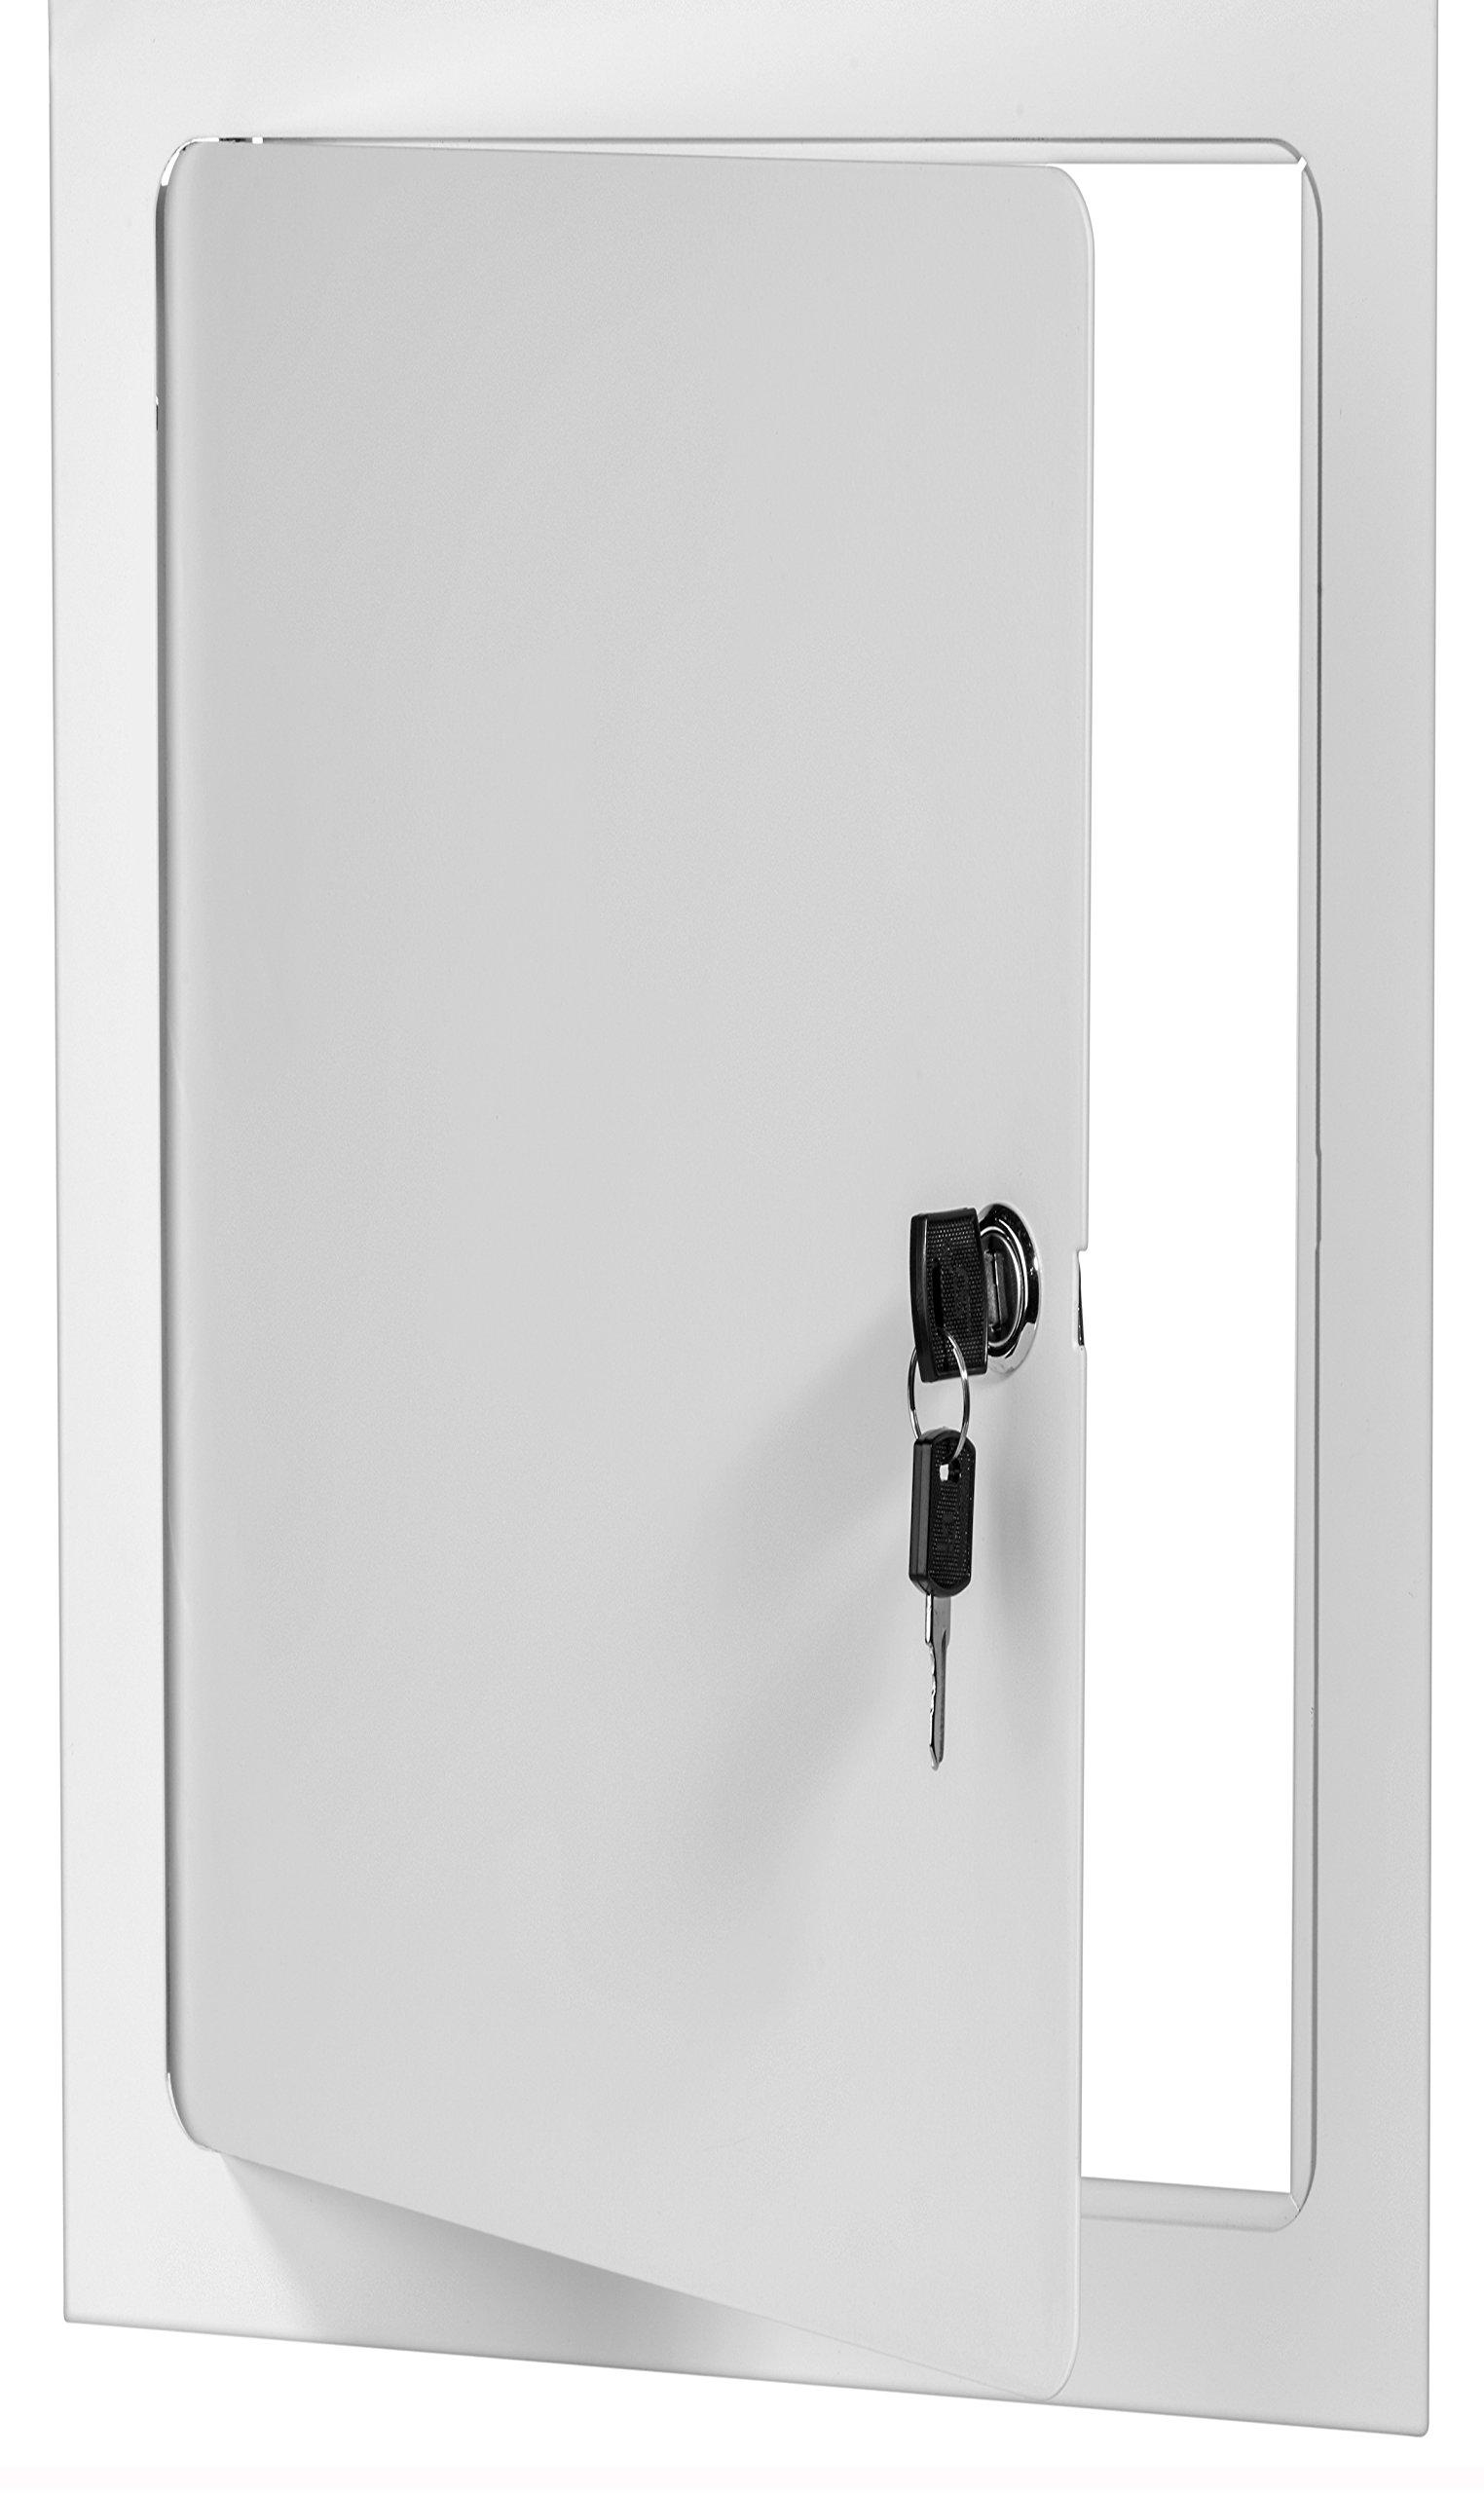 Premier 5000 Series Commercial Grade Steel Access Door, 12 x 24 Flush Universal Mount, White (Keyed Cylinder Latch)